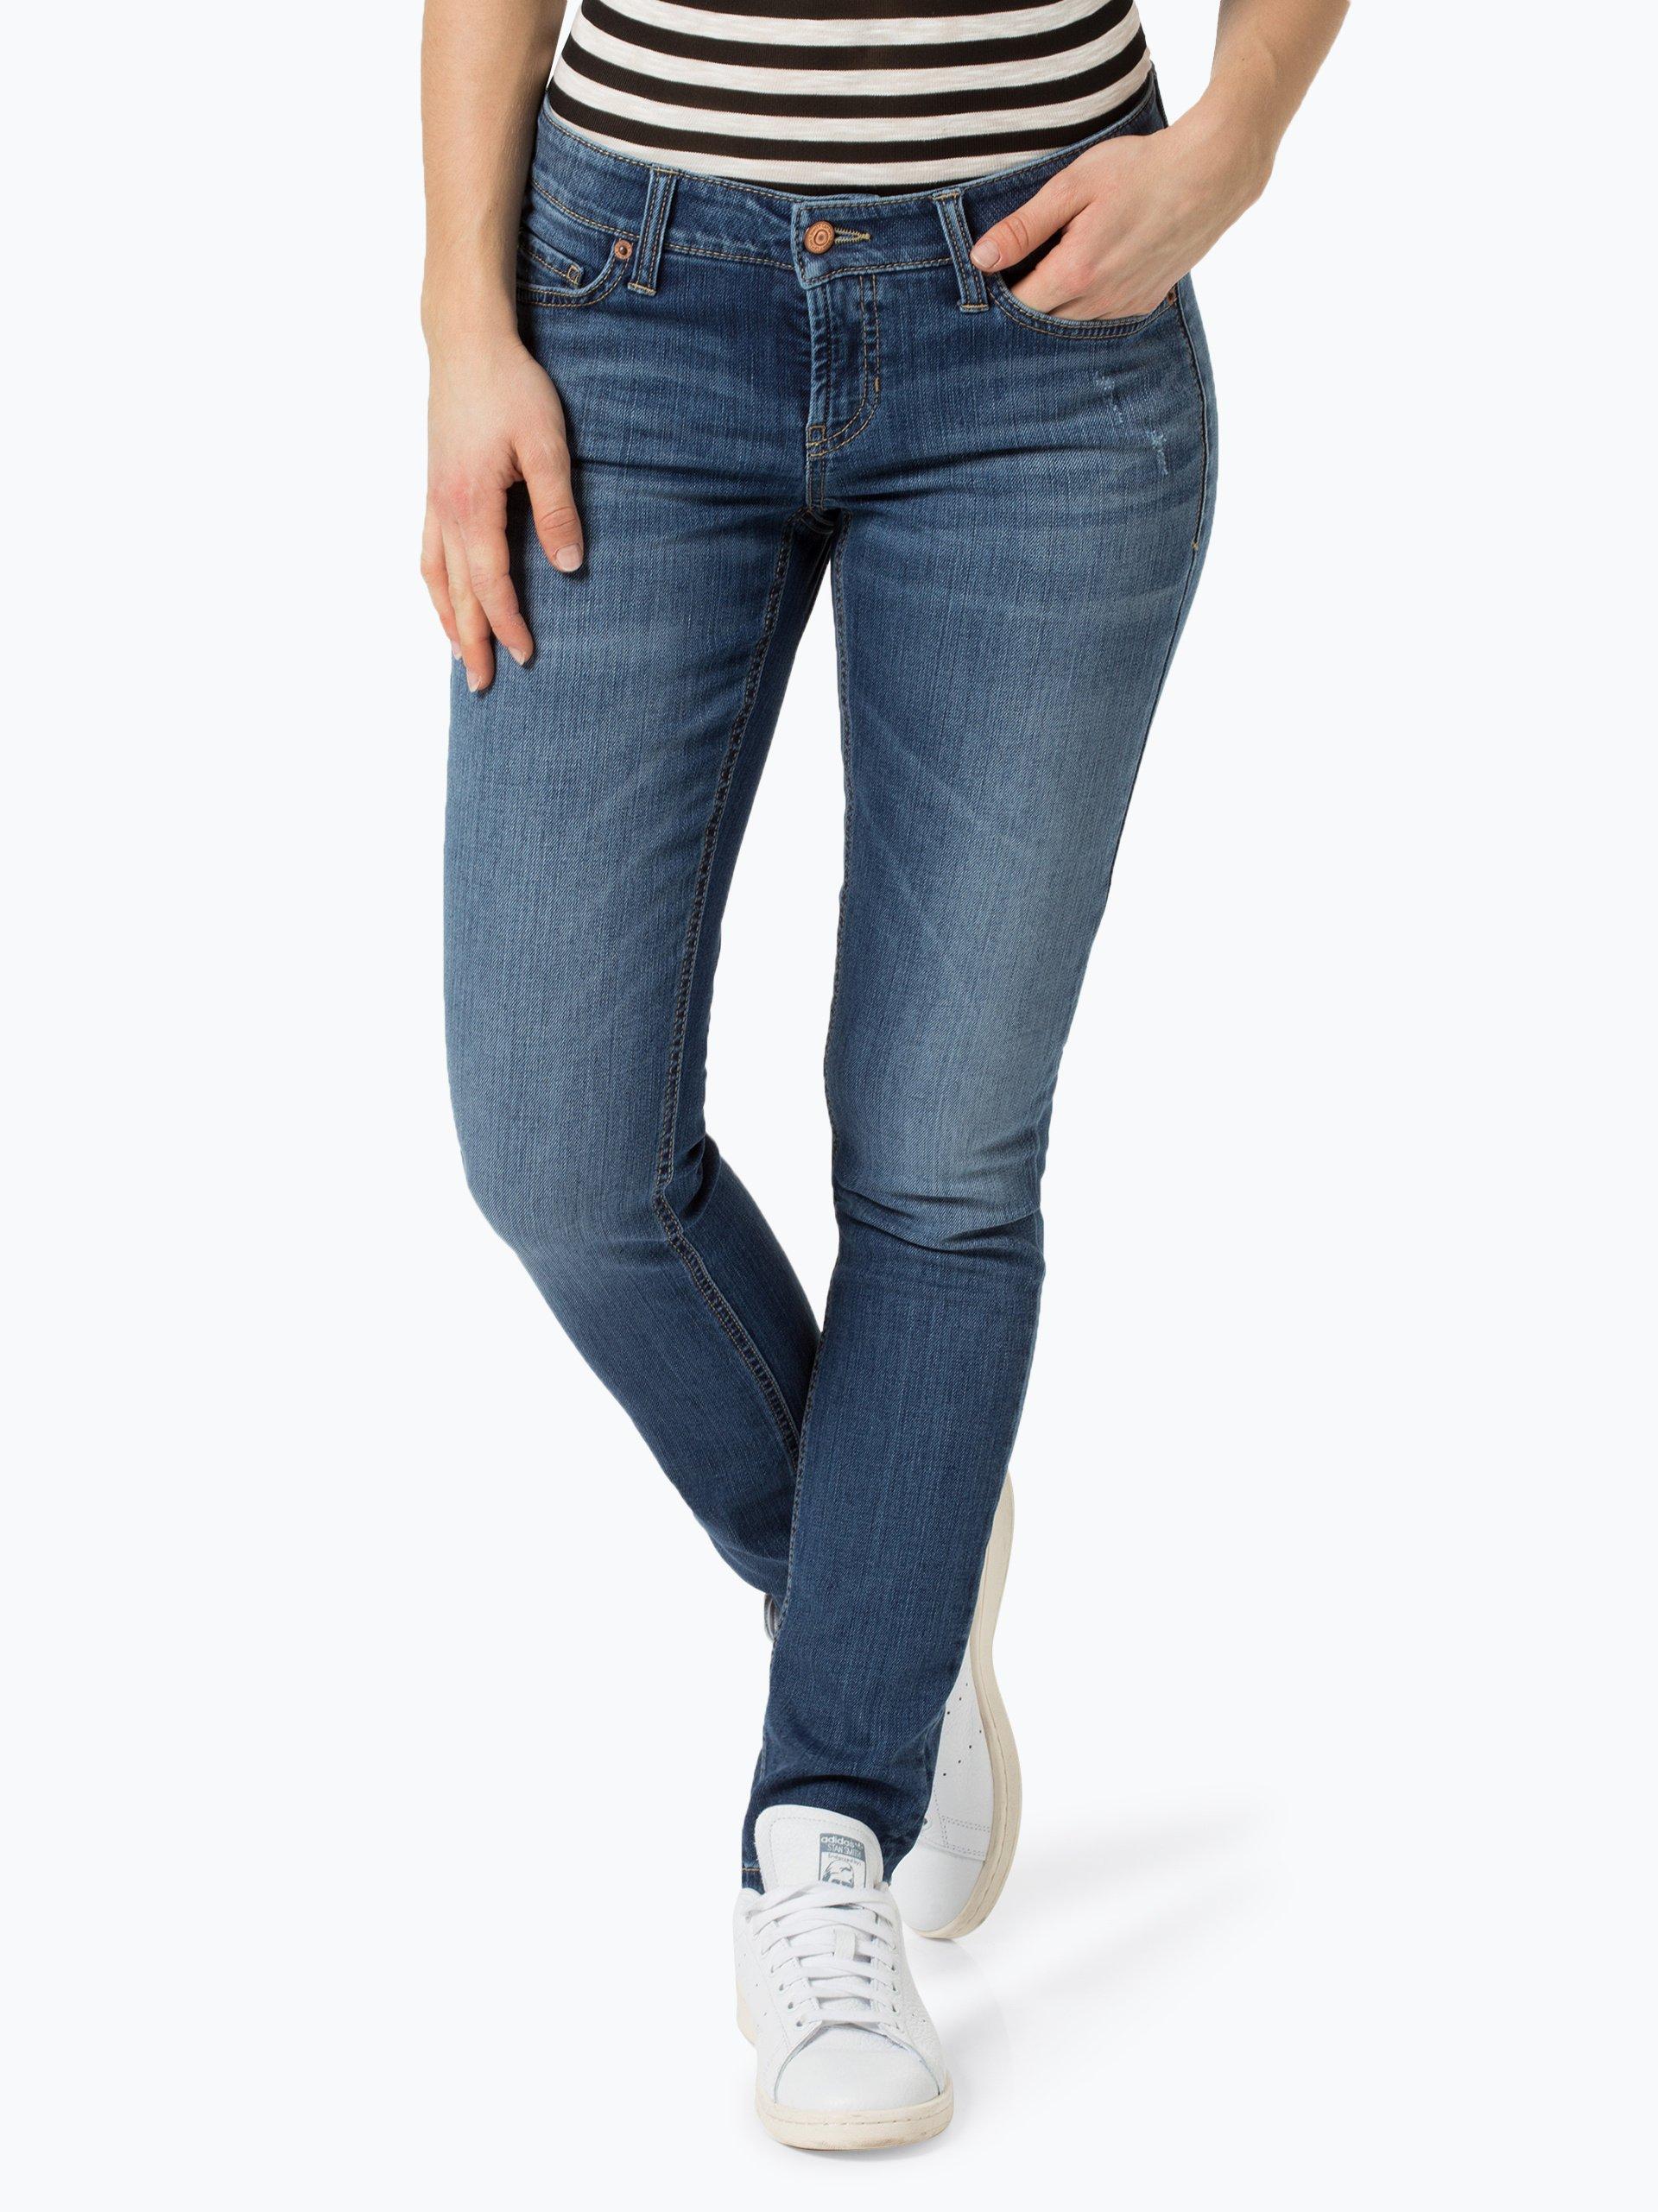 cambio damen jeans liu blue stone uni online kaufen vangraaf com. Black Bedroom Furniture Sets. Home Design Ideas